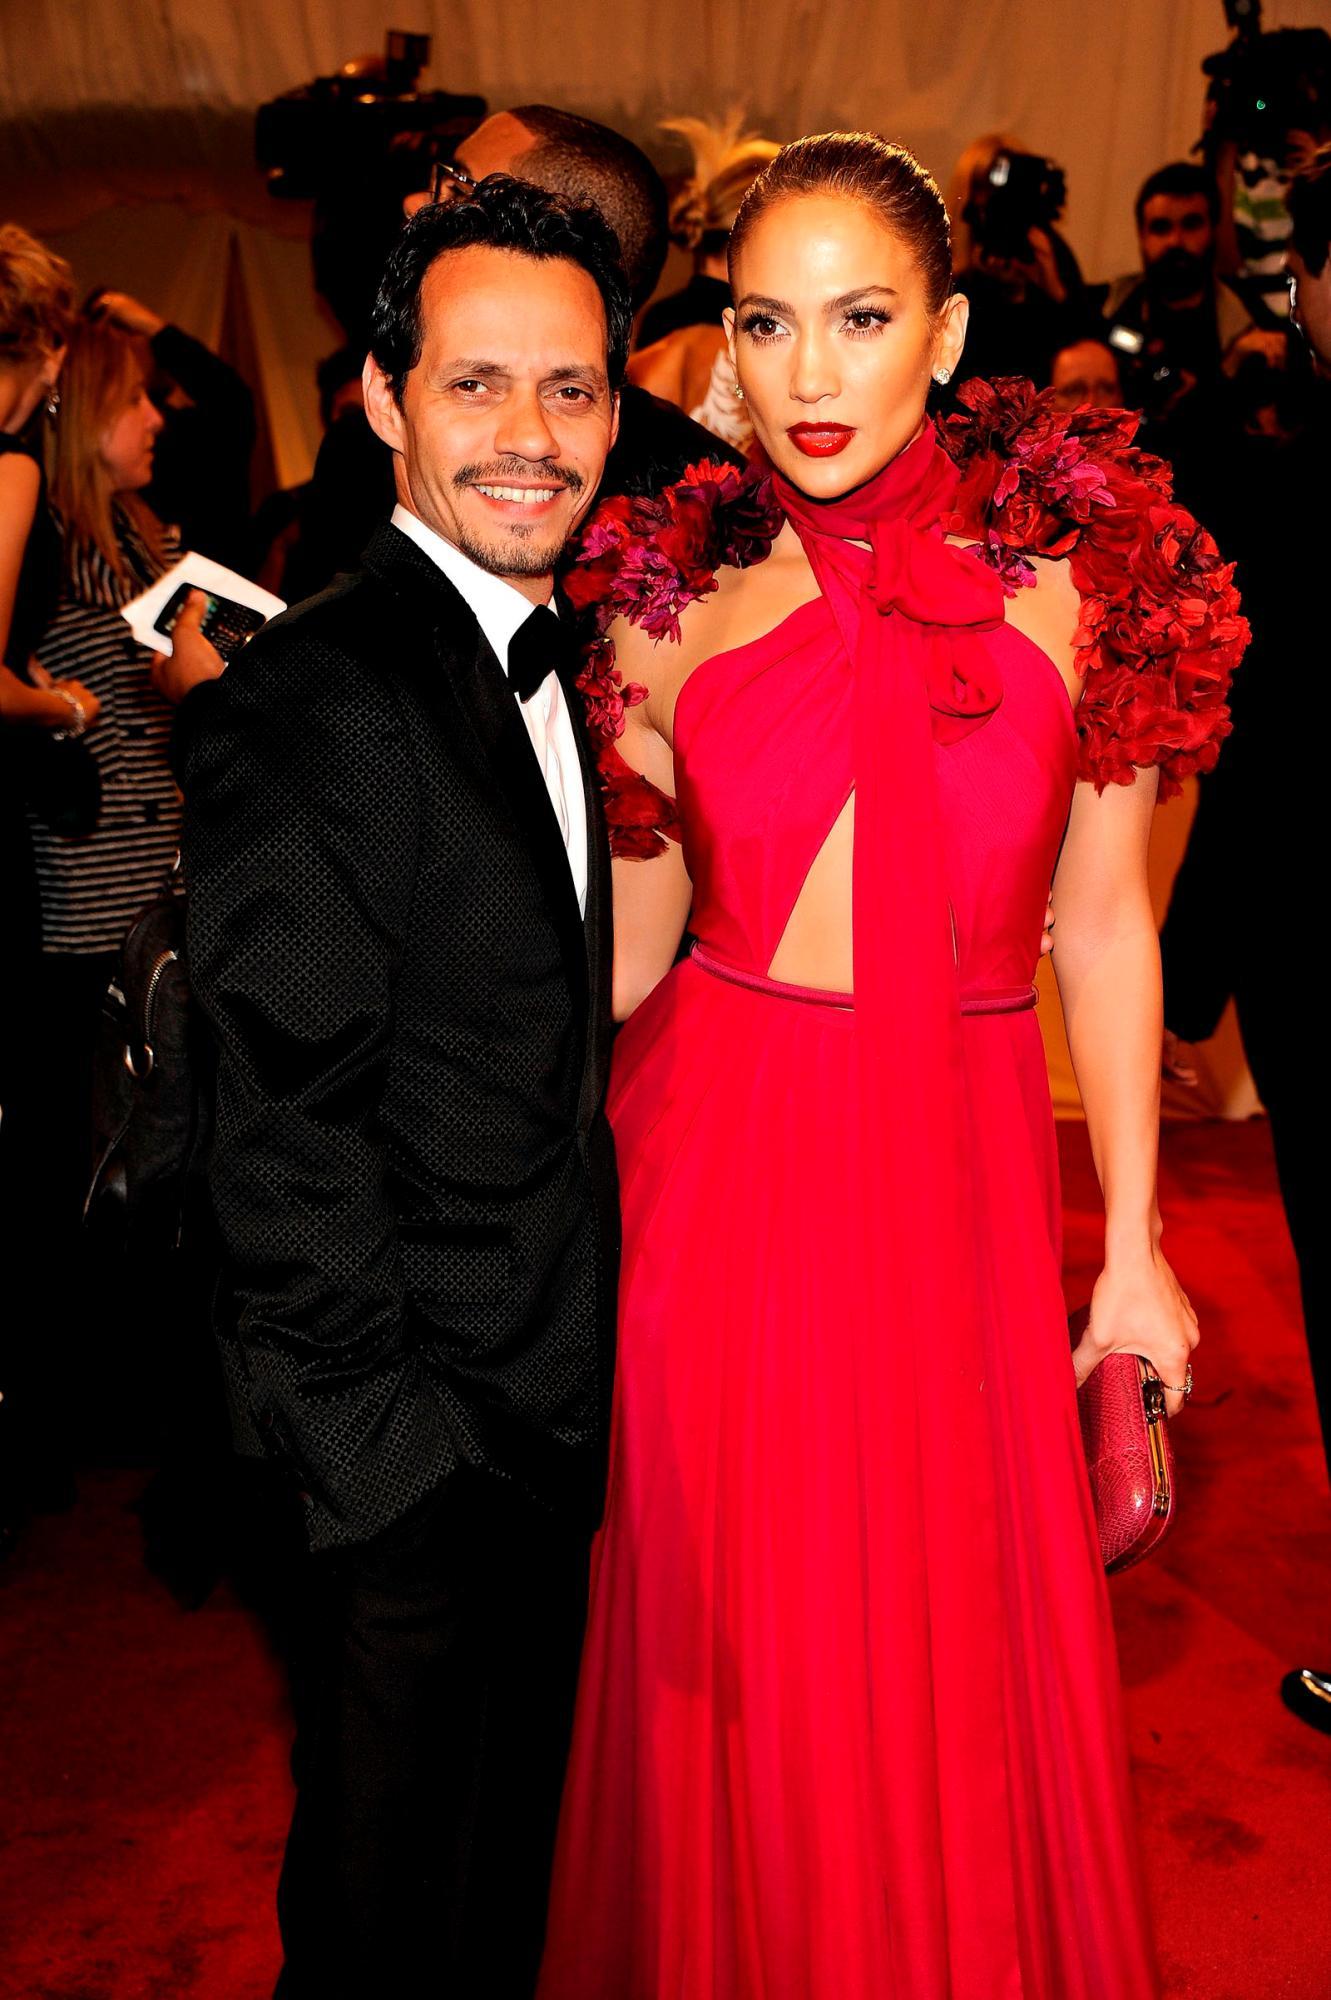 Marc Anthony y Jennifer López en la Met Gala en el año 2011.